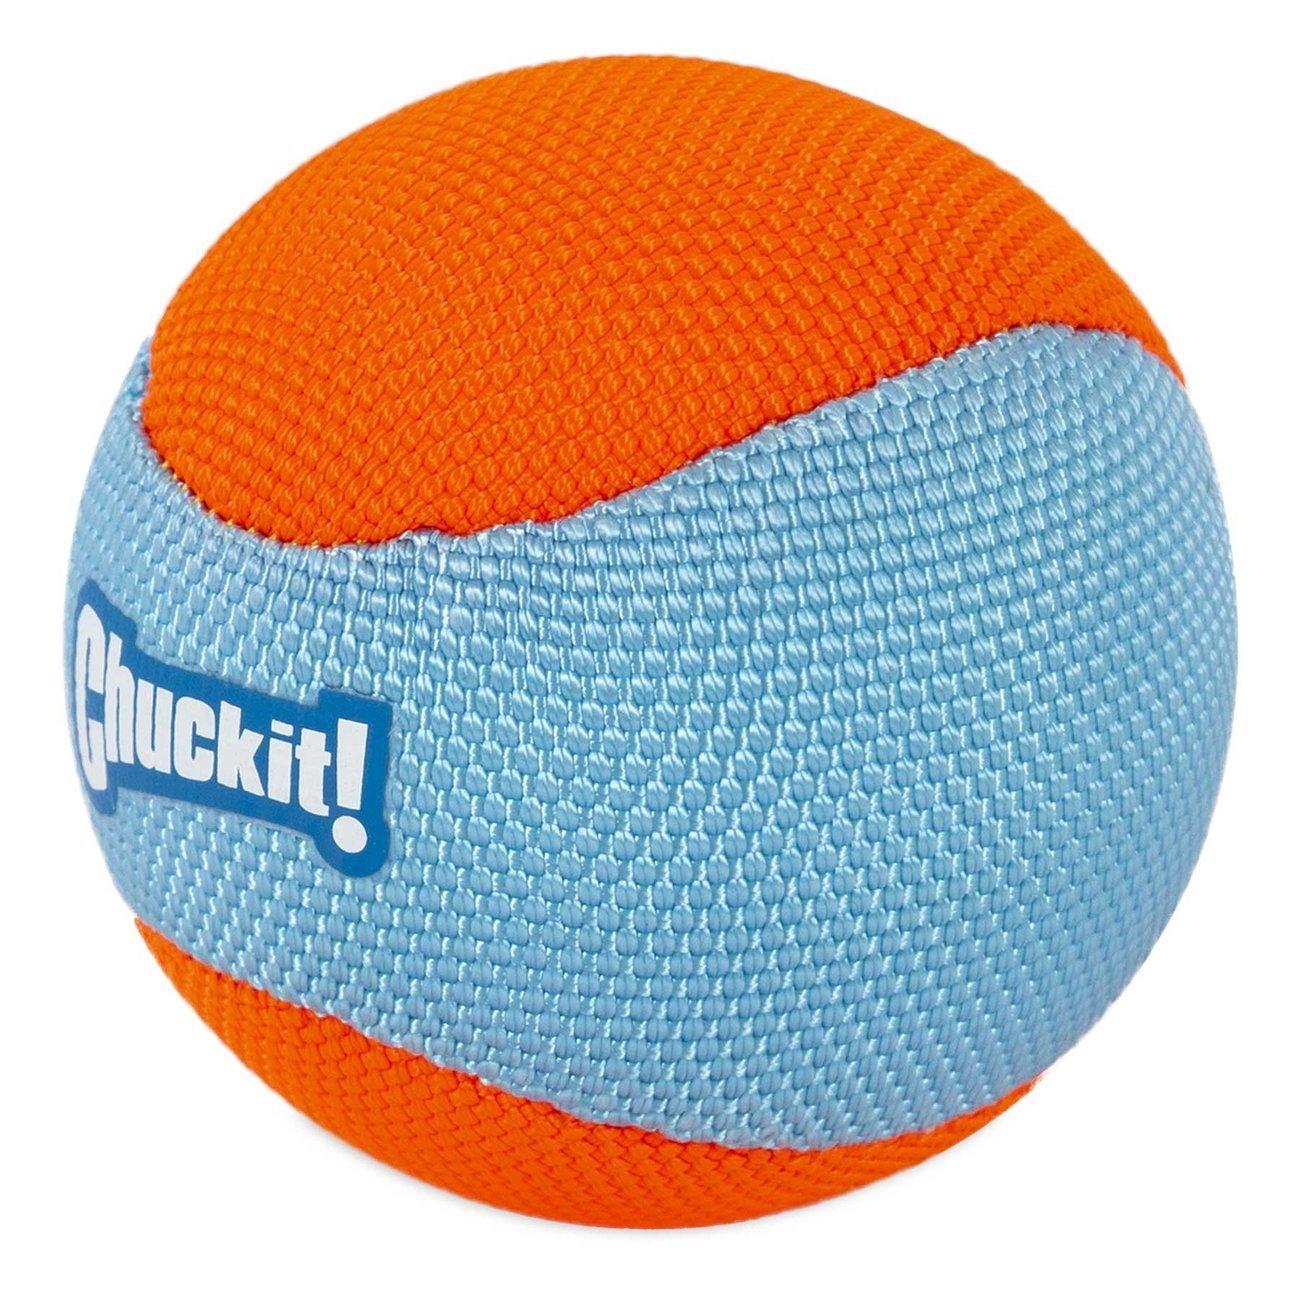 Chuckit! Amphibous Fetch Balls 3-Pack, Bild 3